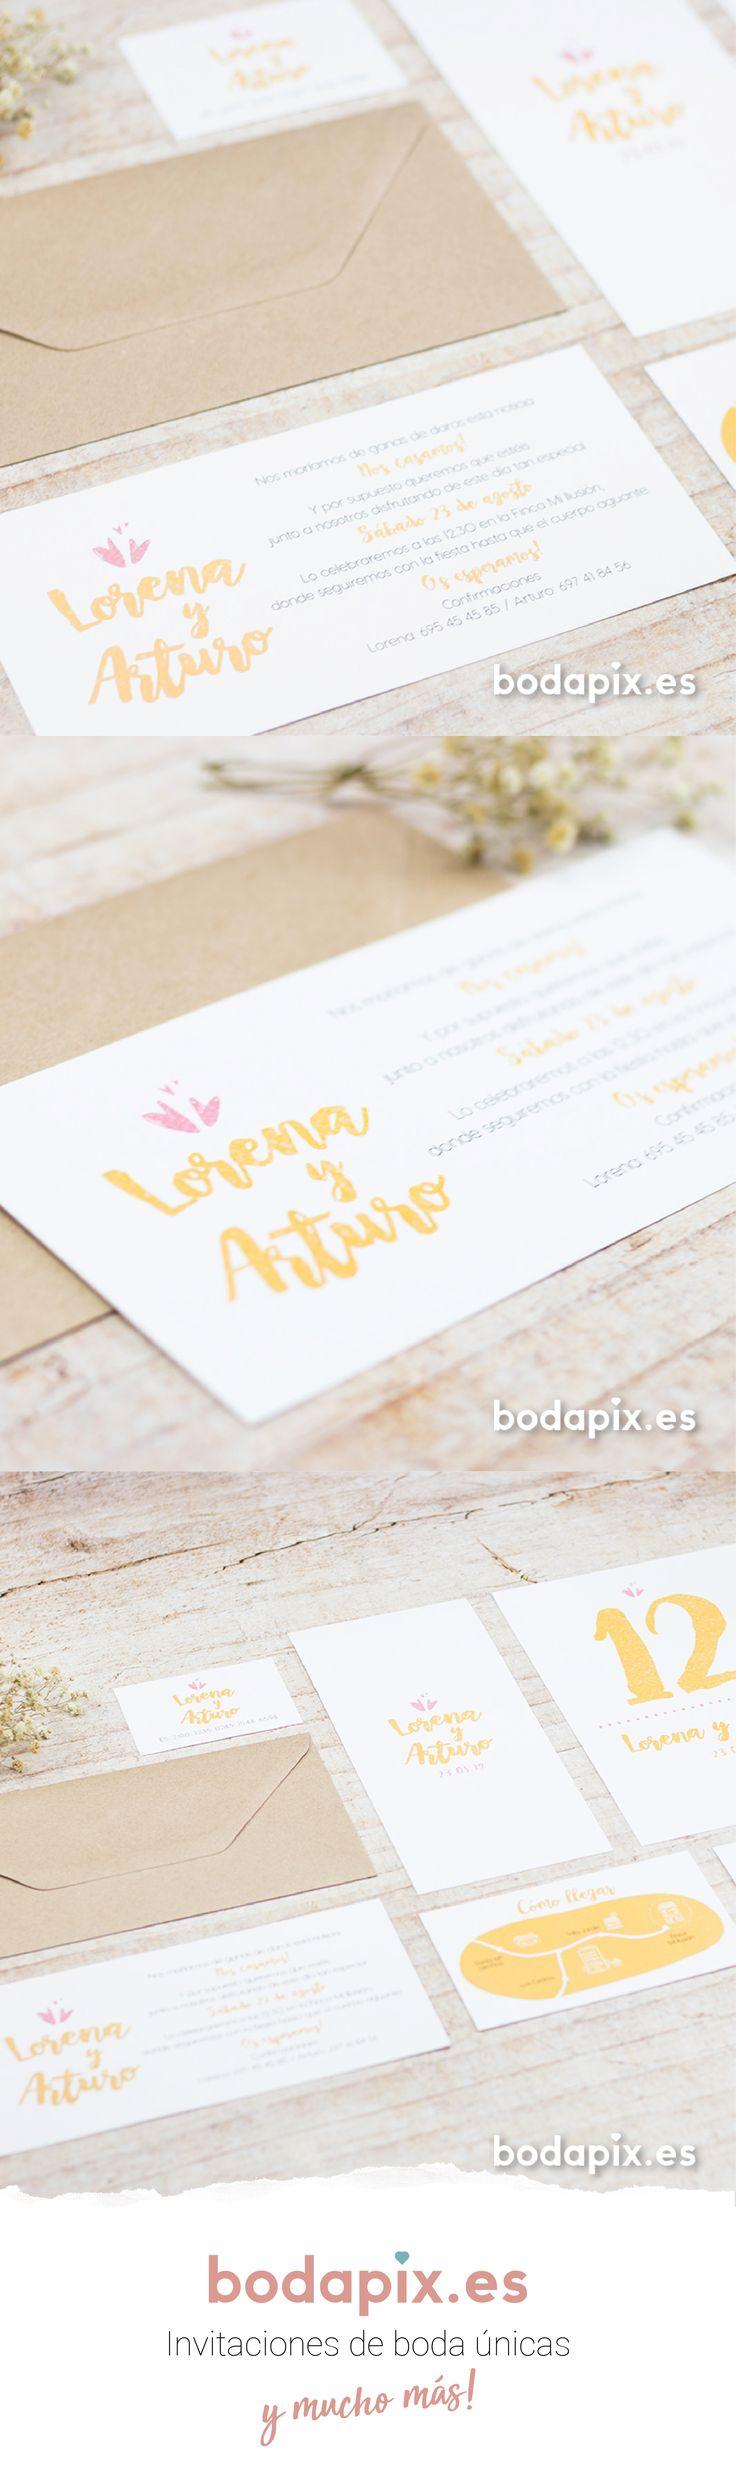 Invitación de boda lettering ideal para parejas sencillas – Modelo Smile 1 – Colección Bodapix #bodapix #bodas #invitaciones #wedding #weddinginvitations #cards